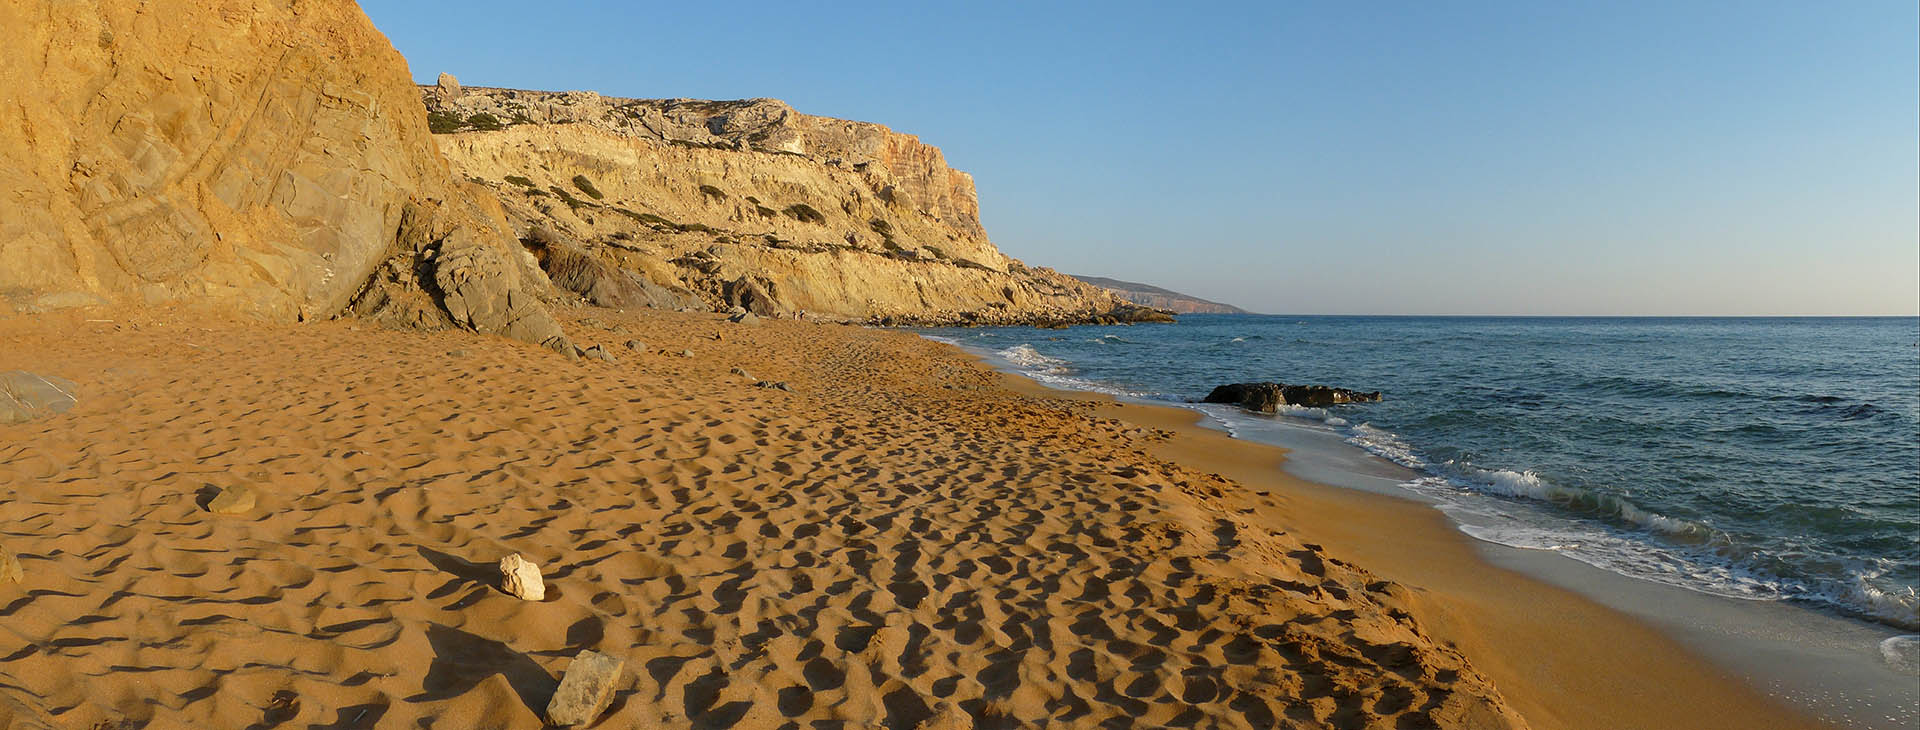 Beach at Heraklion